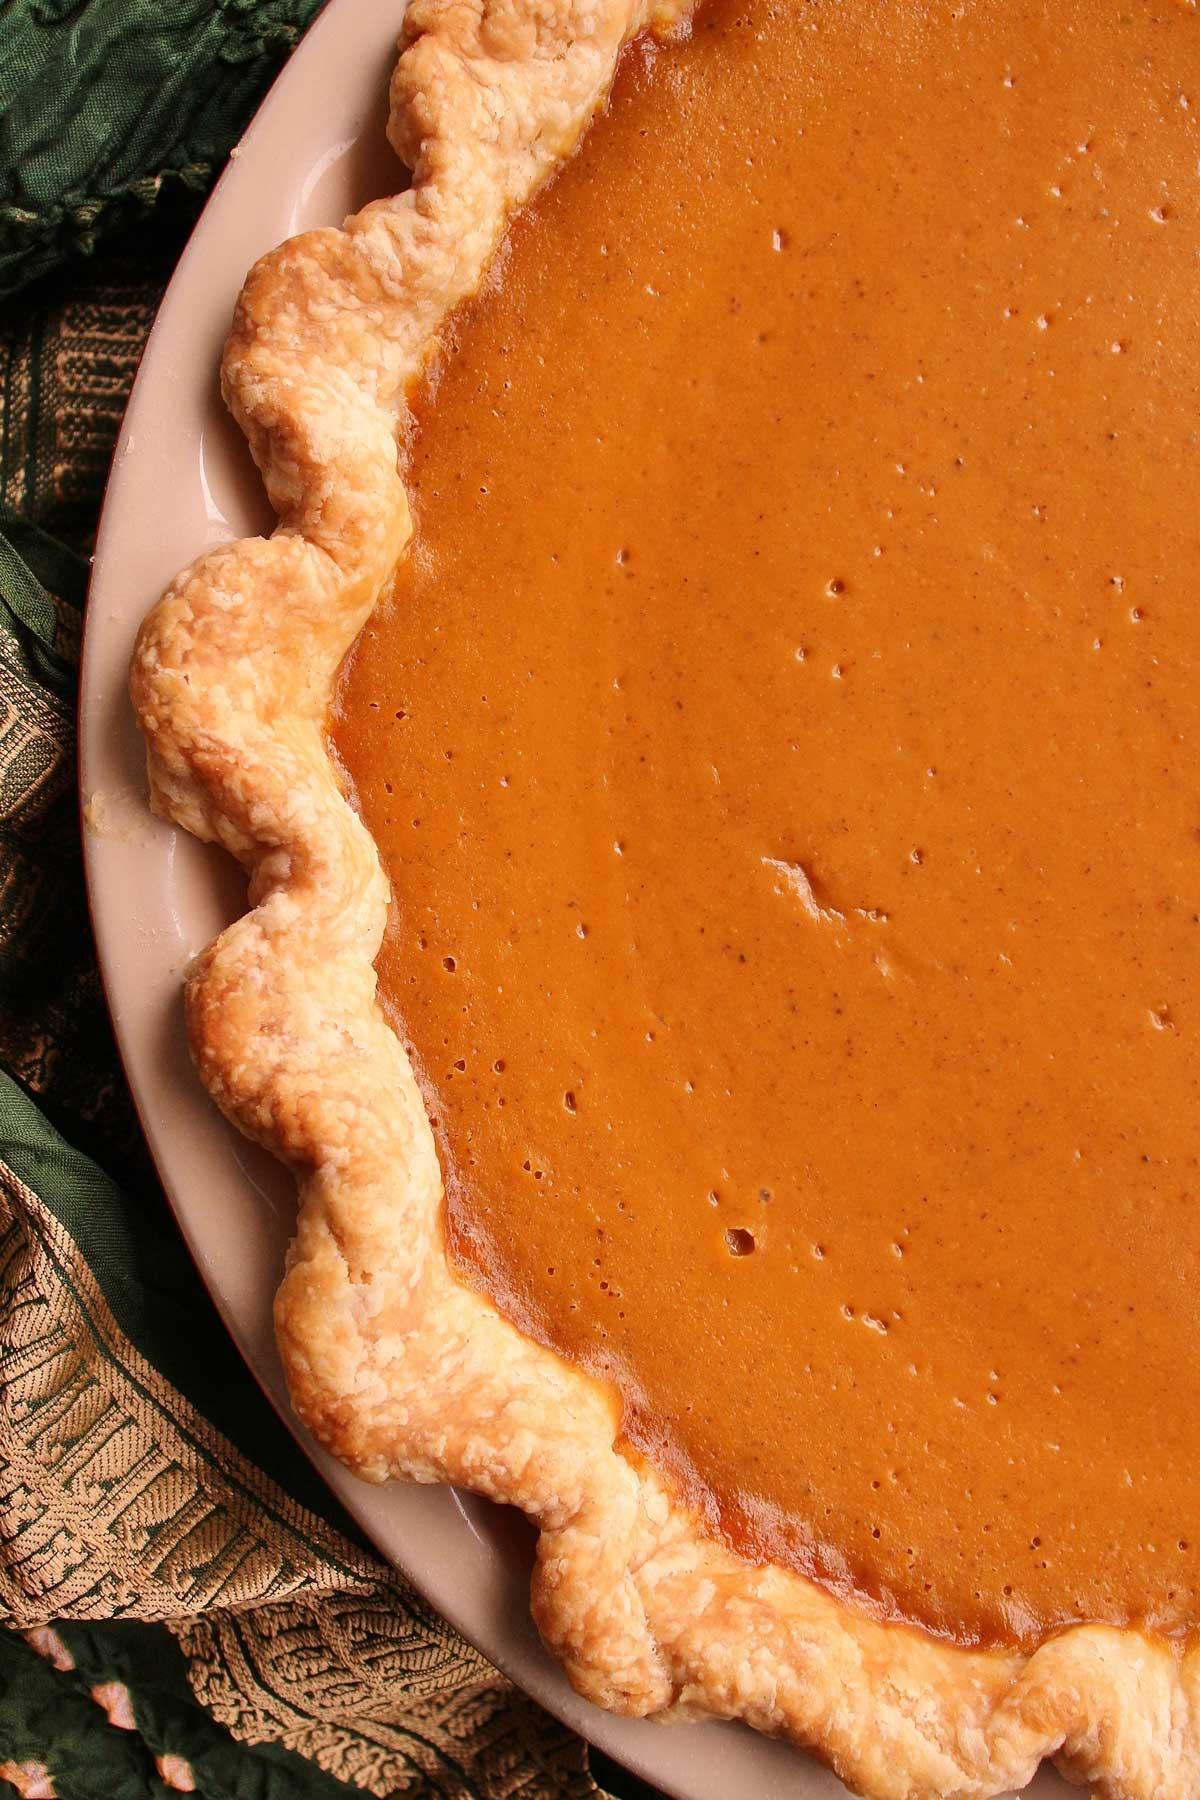 Closeup of one edge of a pumpkin pie with crimped edge in a ceramic pie dish.